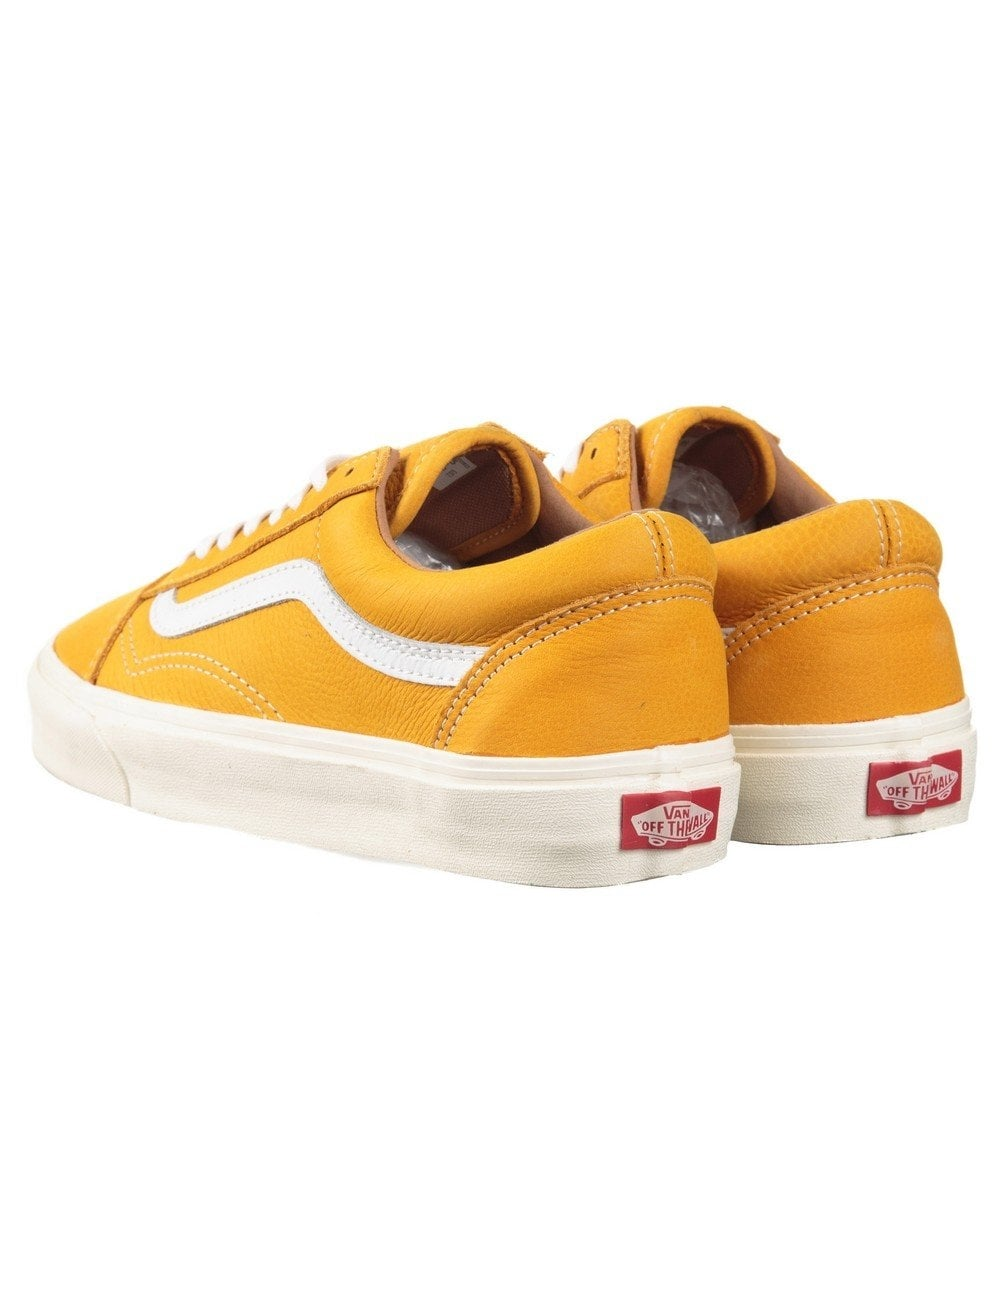 yellow old skool vans